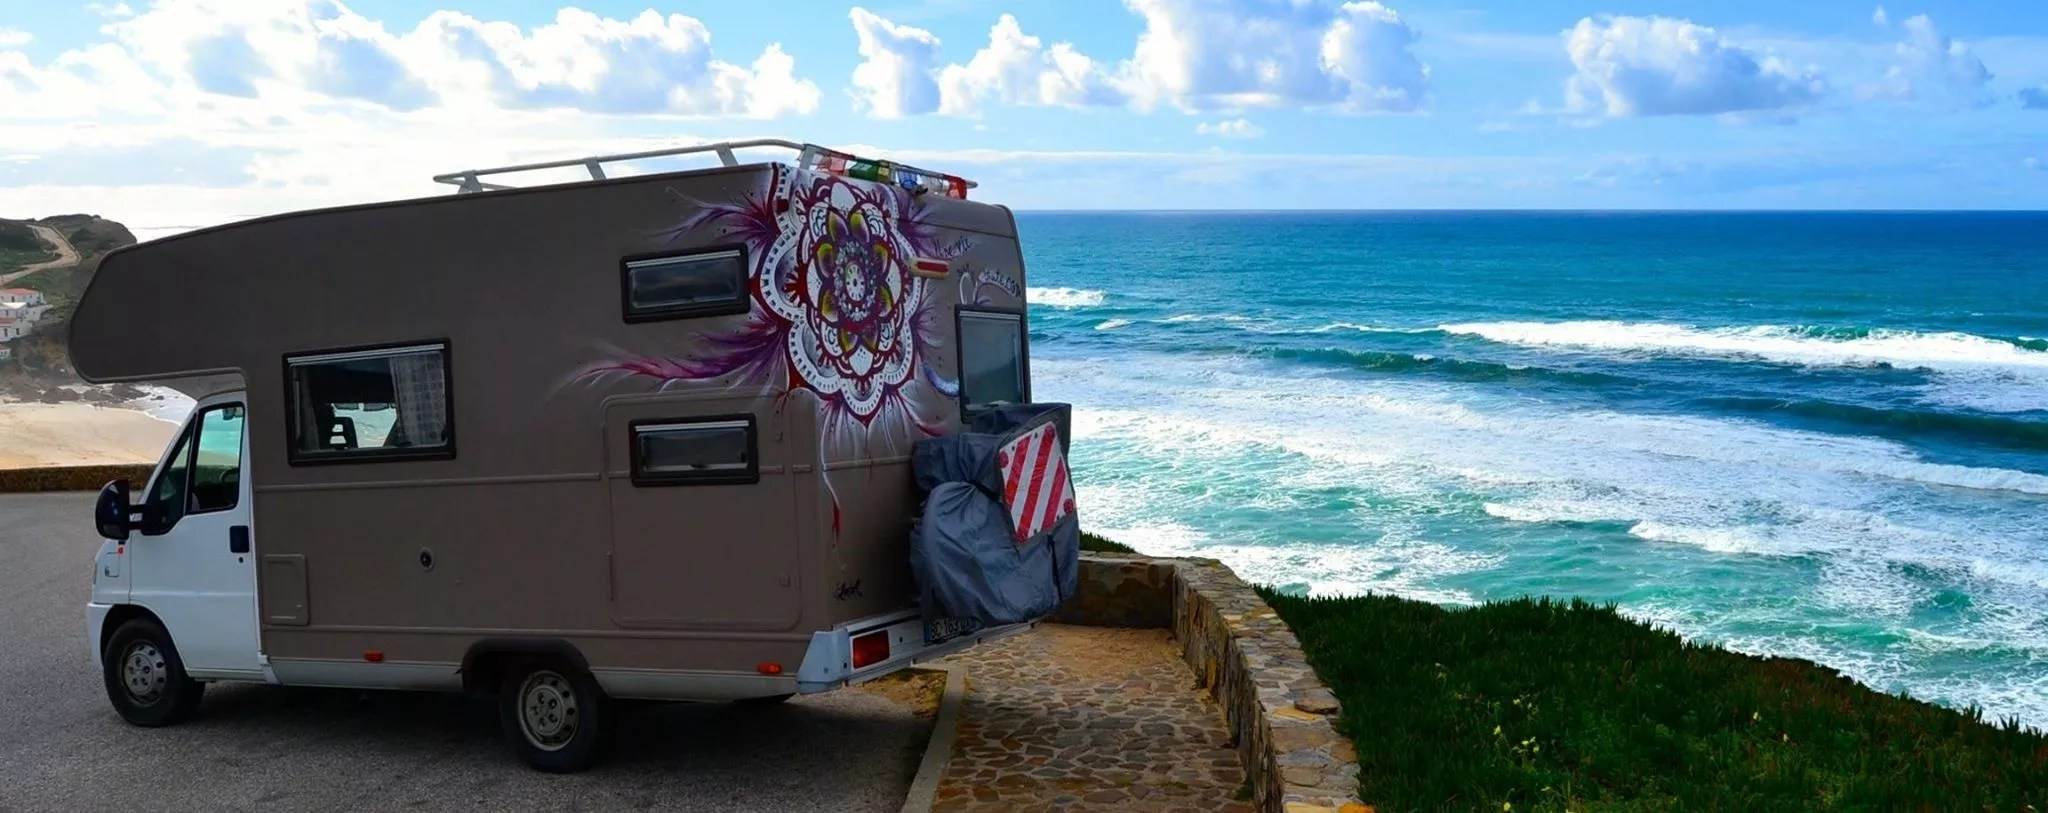 Vivre en camping car